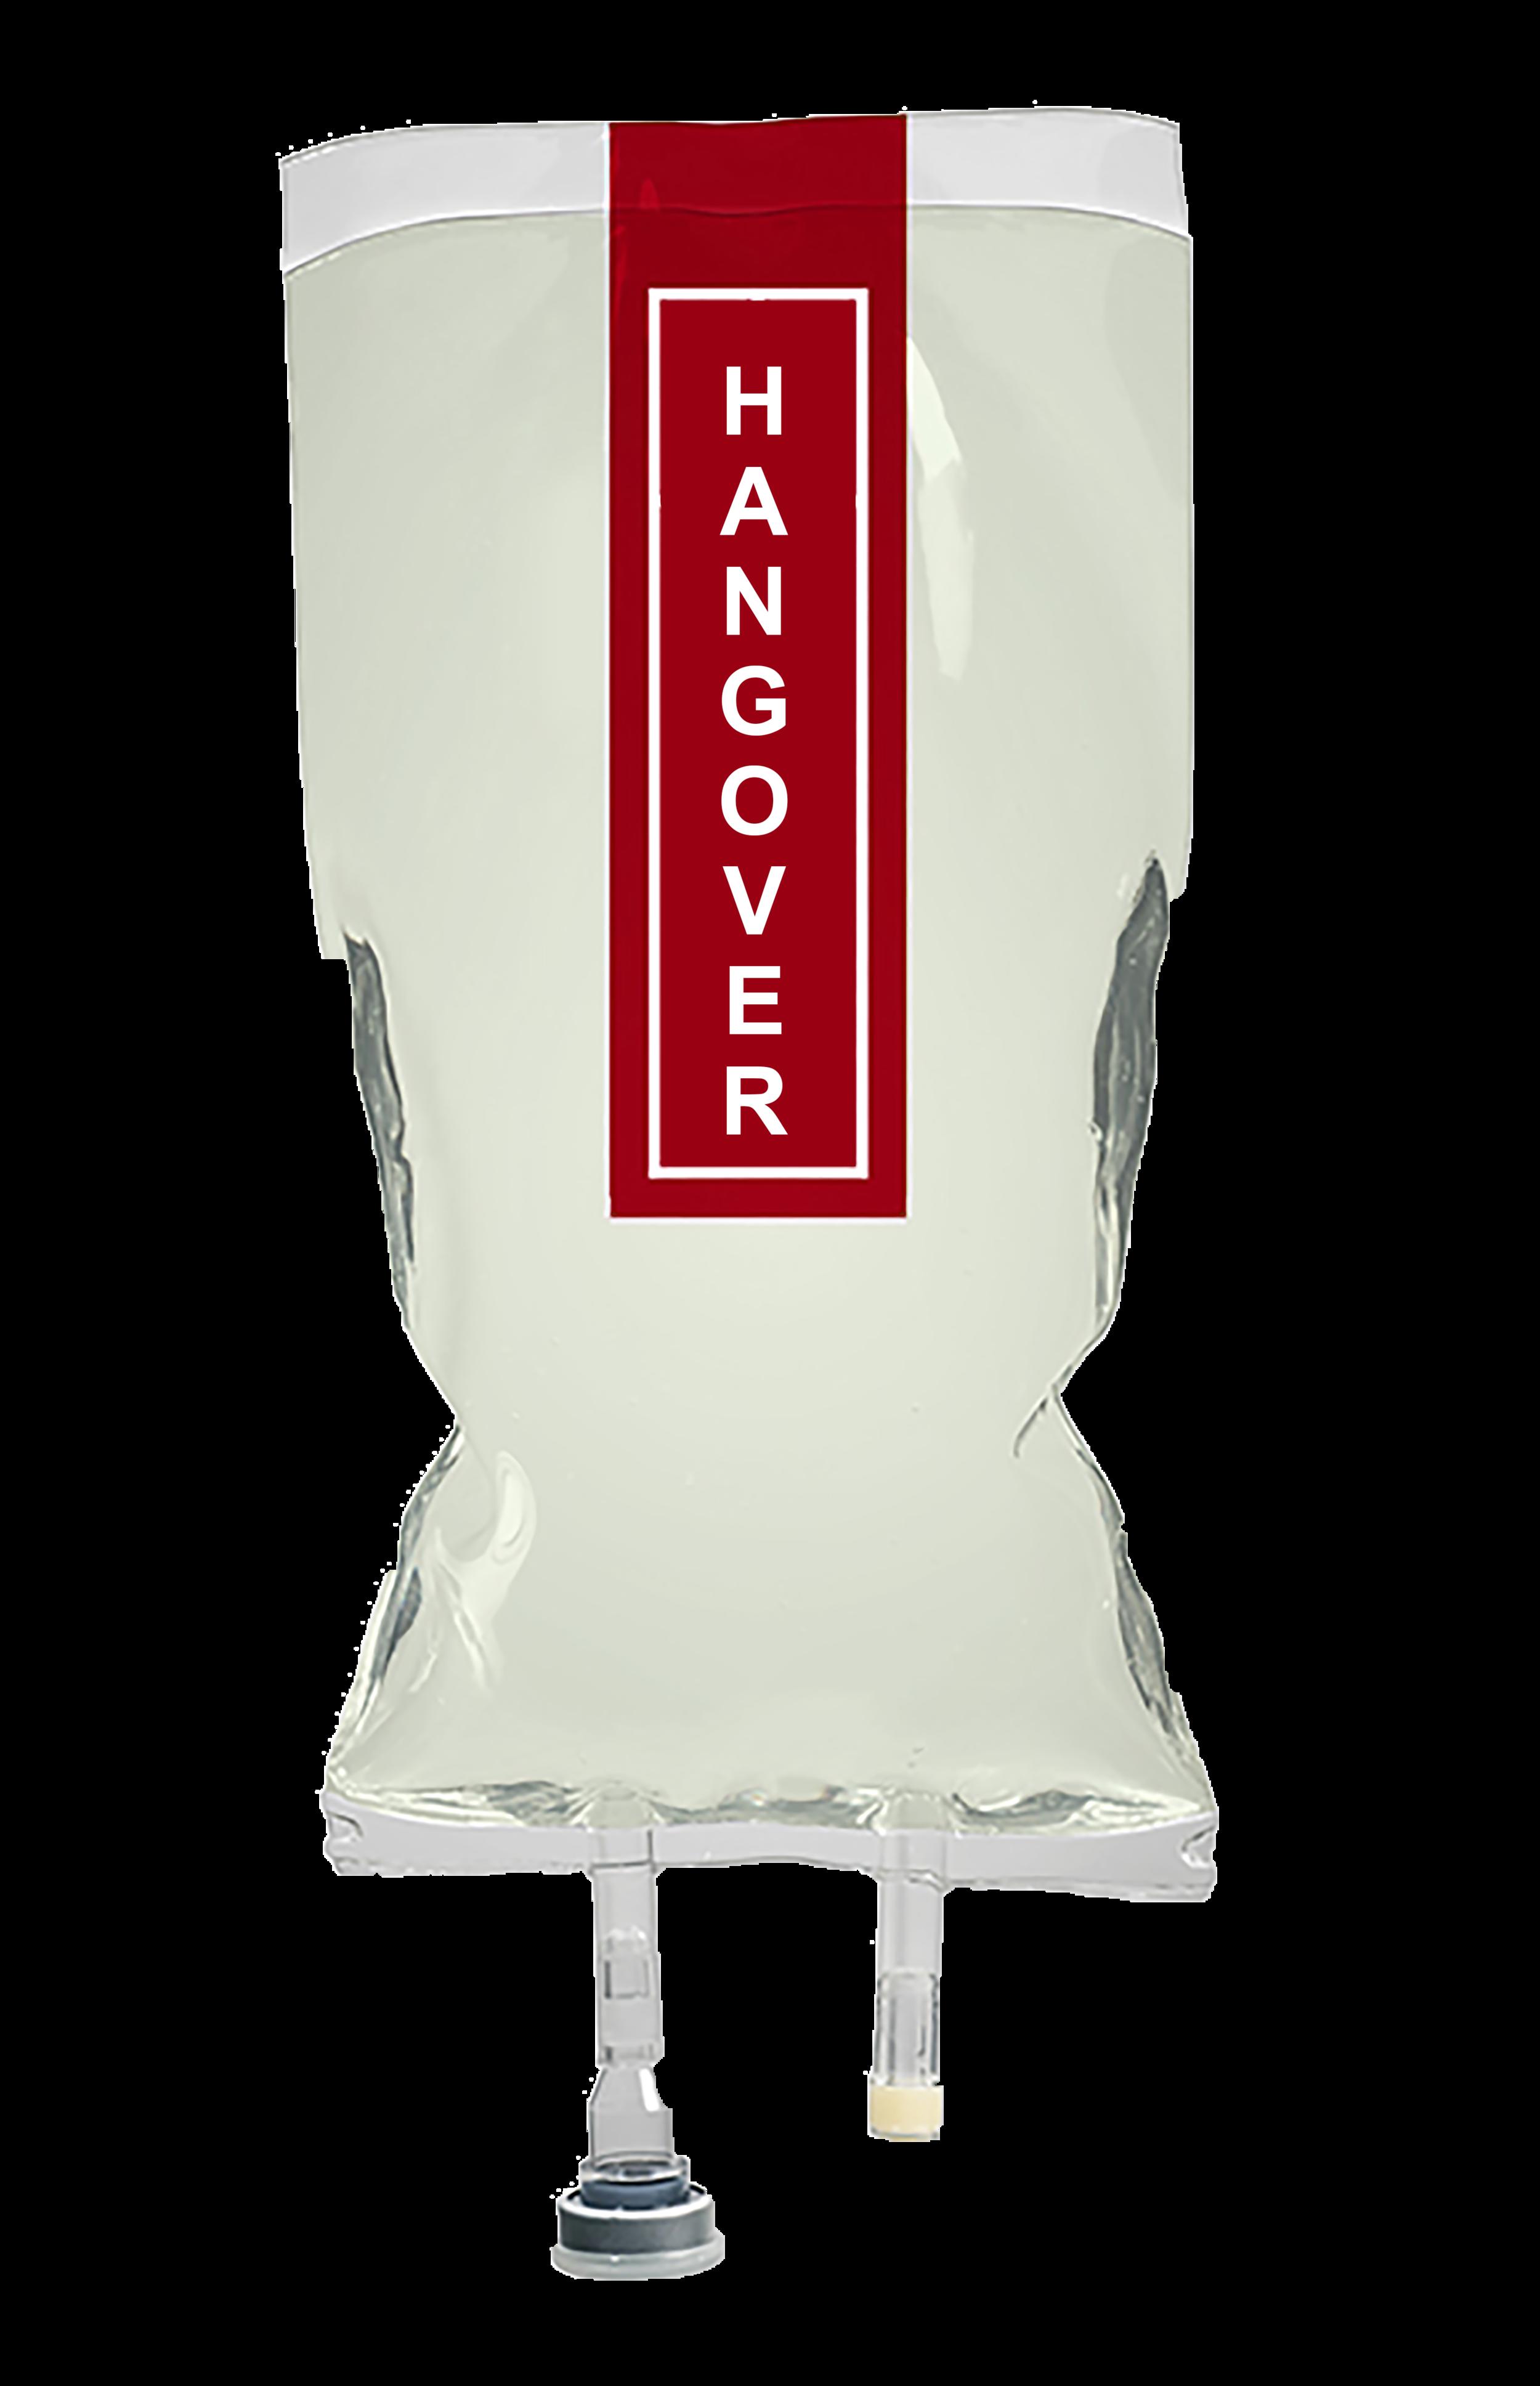 Hangover.png